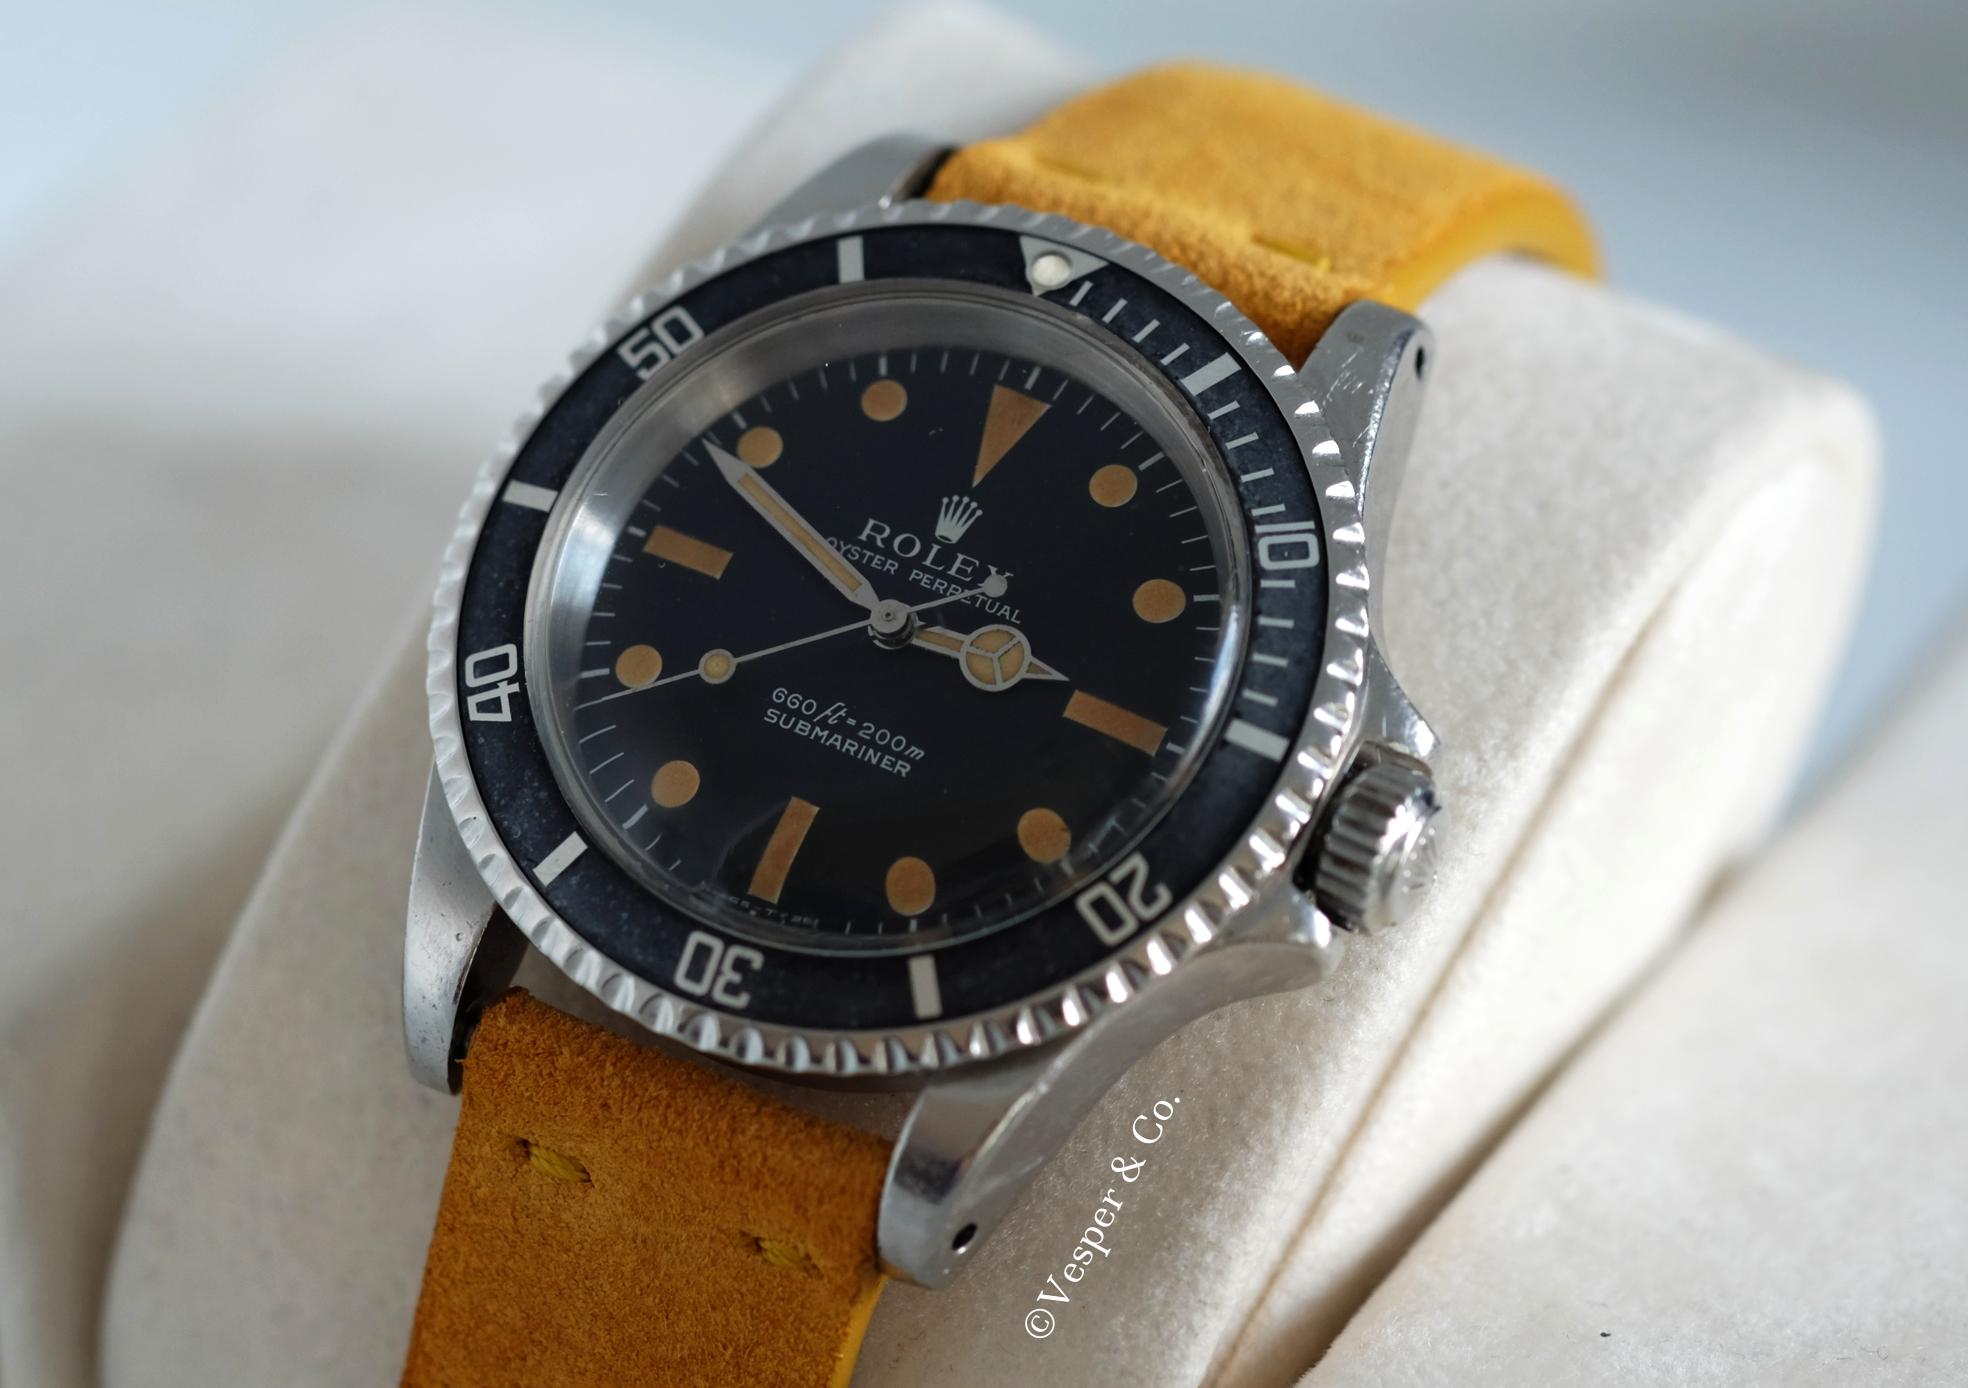 Rolex-5513.jpg